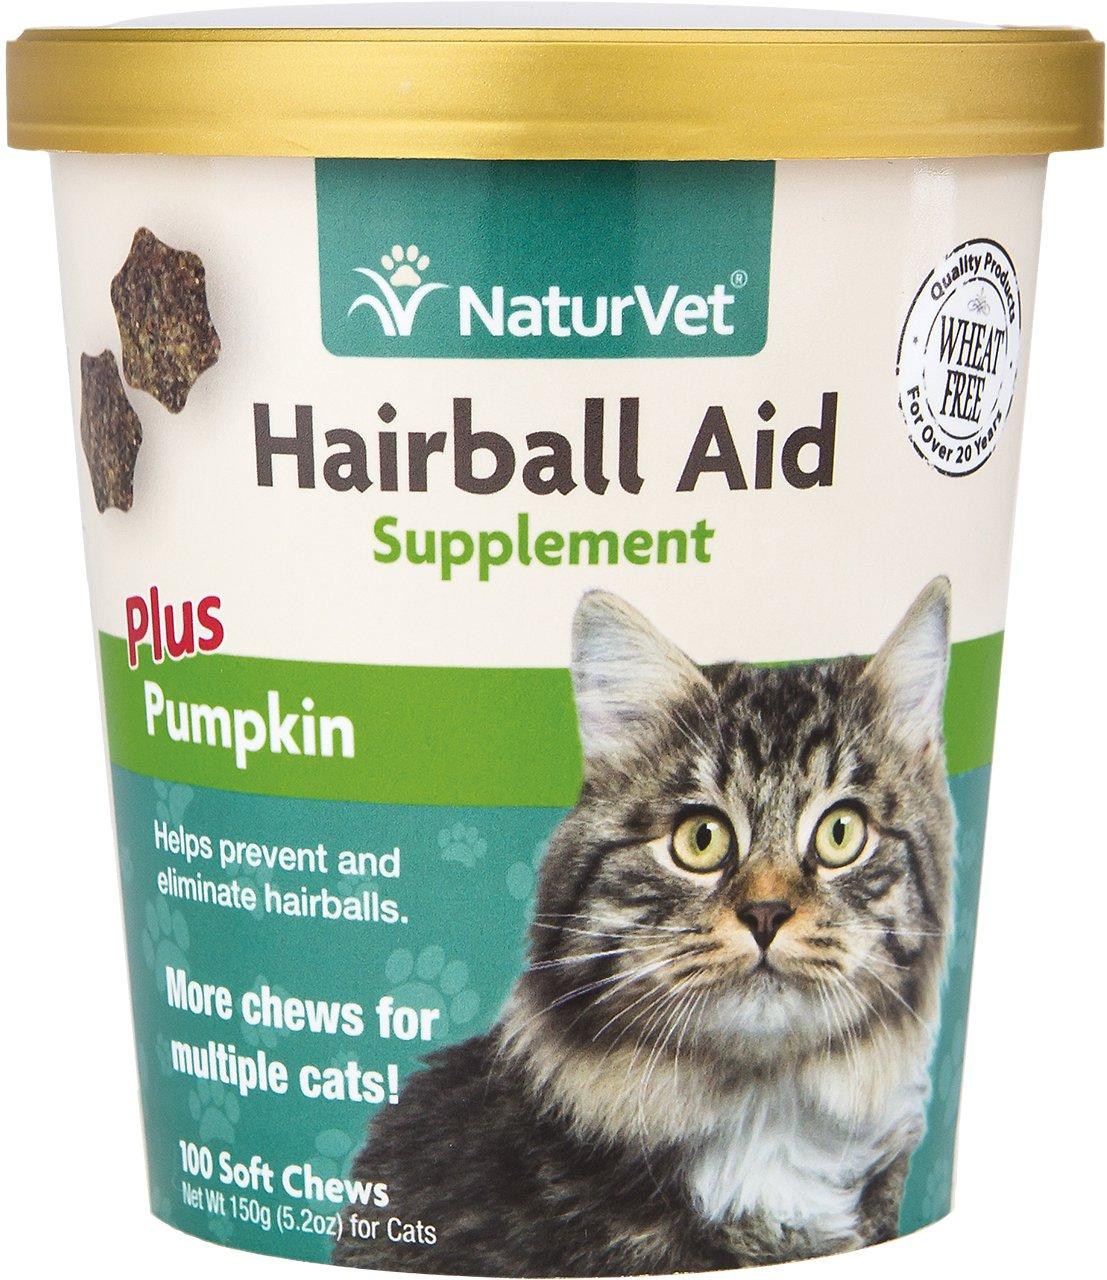 NaturVet Hairball Aid Suppliment Plus Pumpkin Cat Soft Chews Image